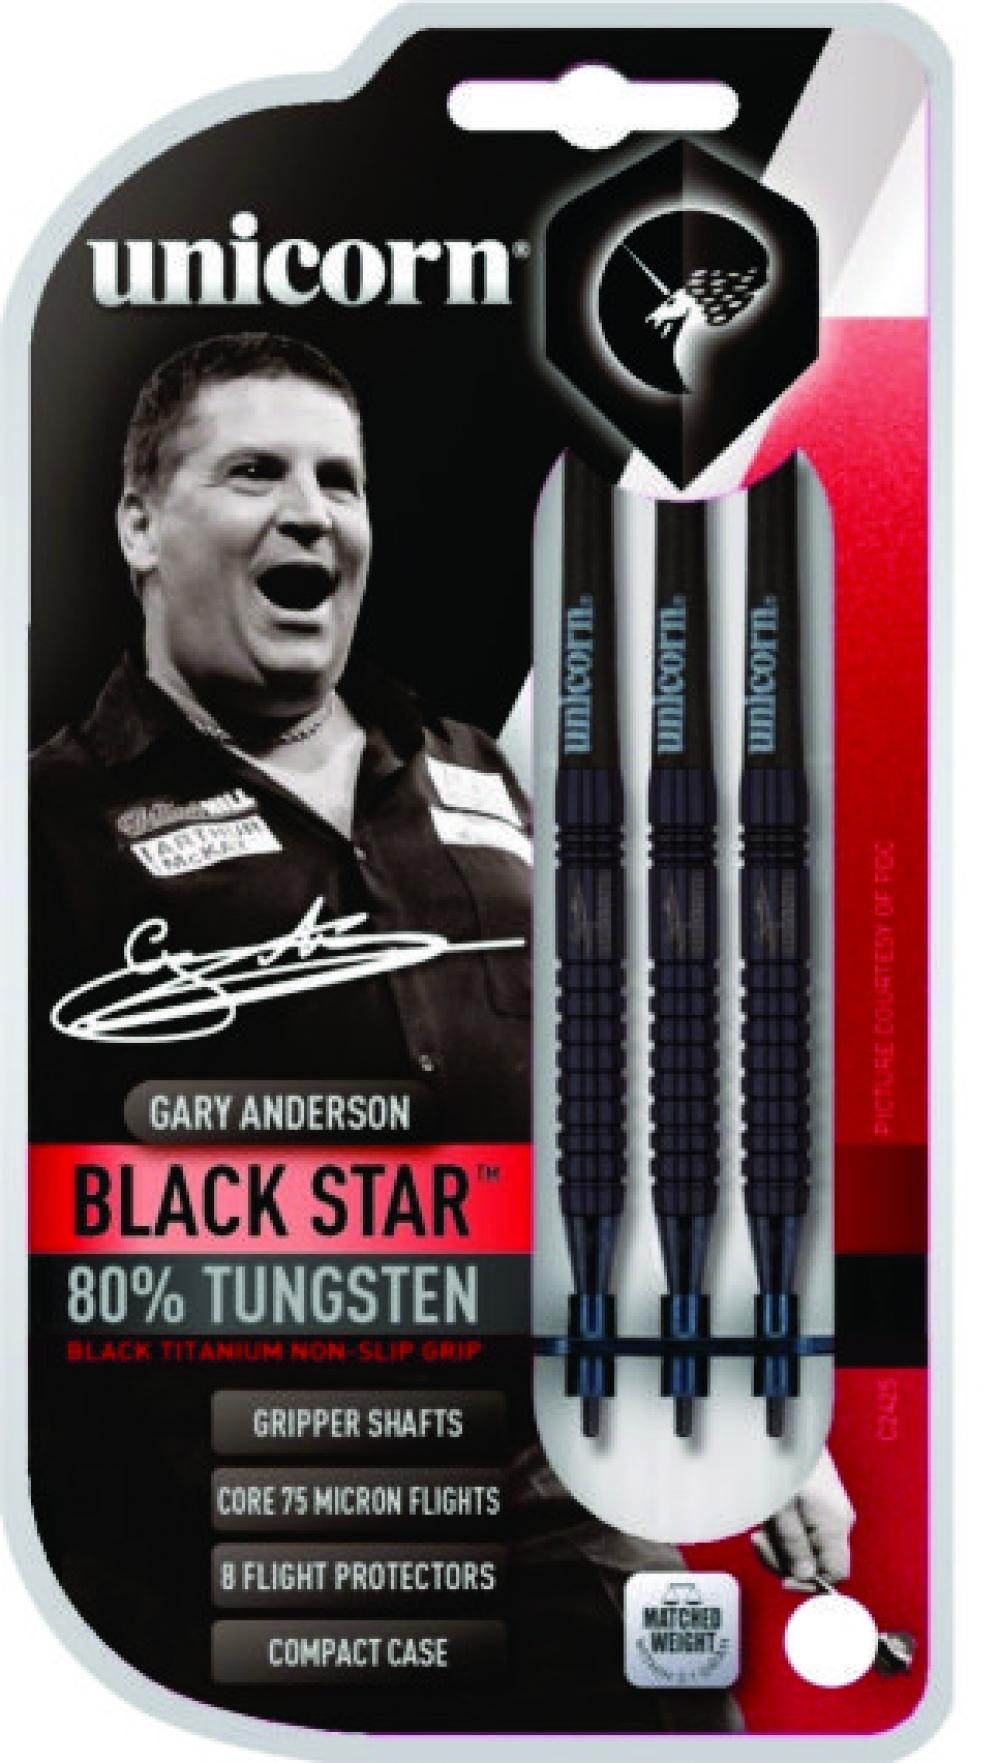 23216-ŠIPKY T-80% BLACK STAR G.ANDERSON 17 gram - sleva 30% !!! AKCE0911 akce do